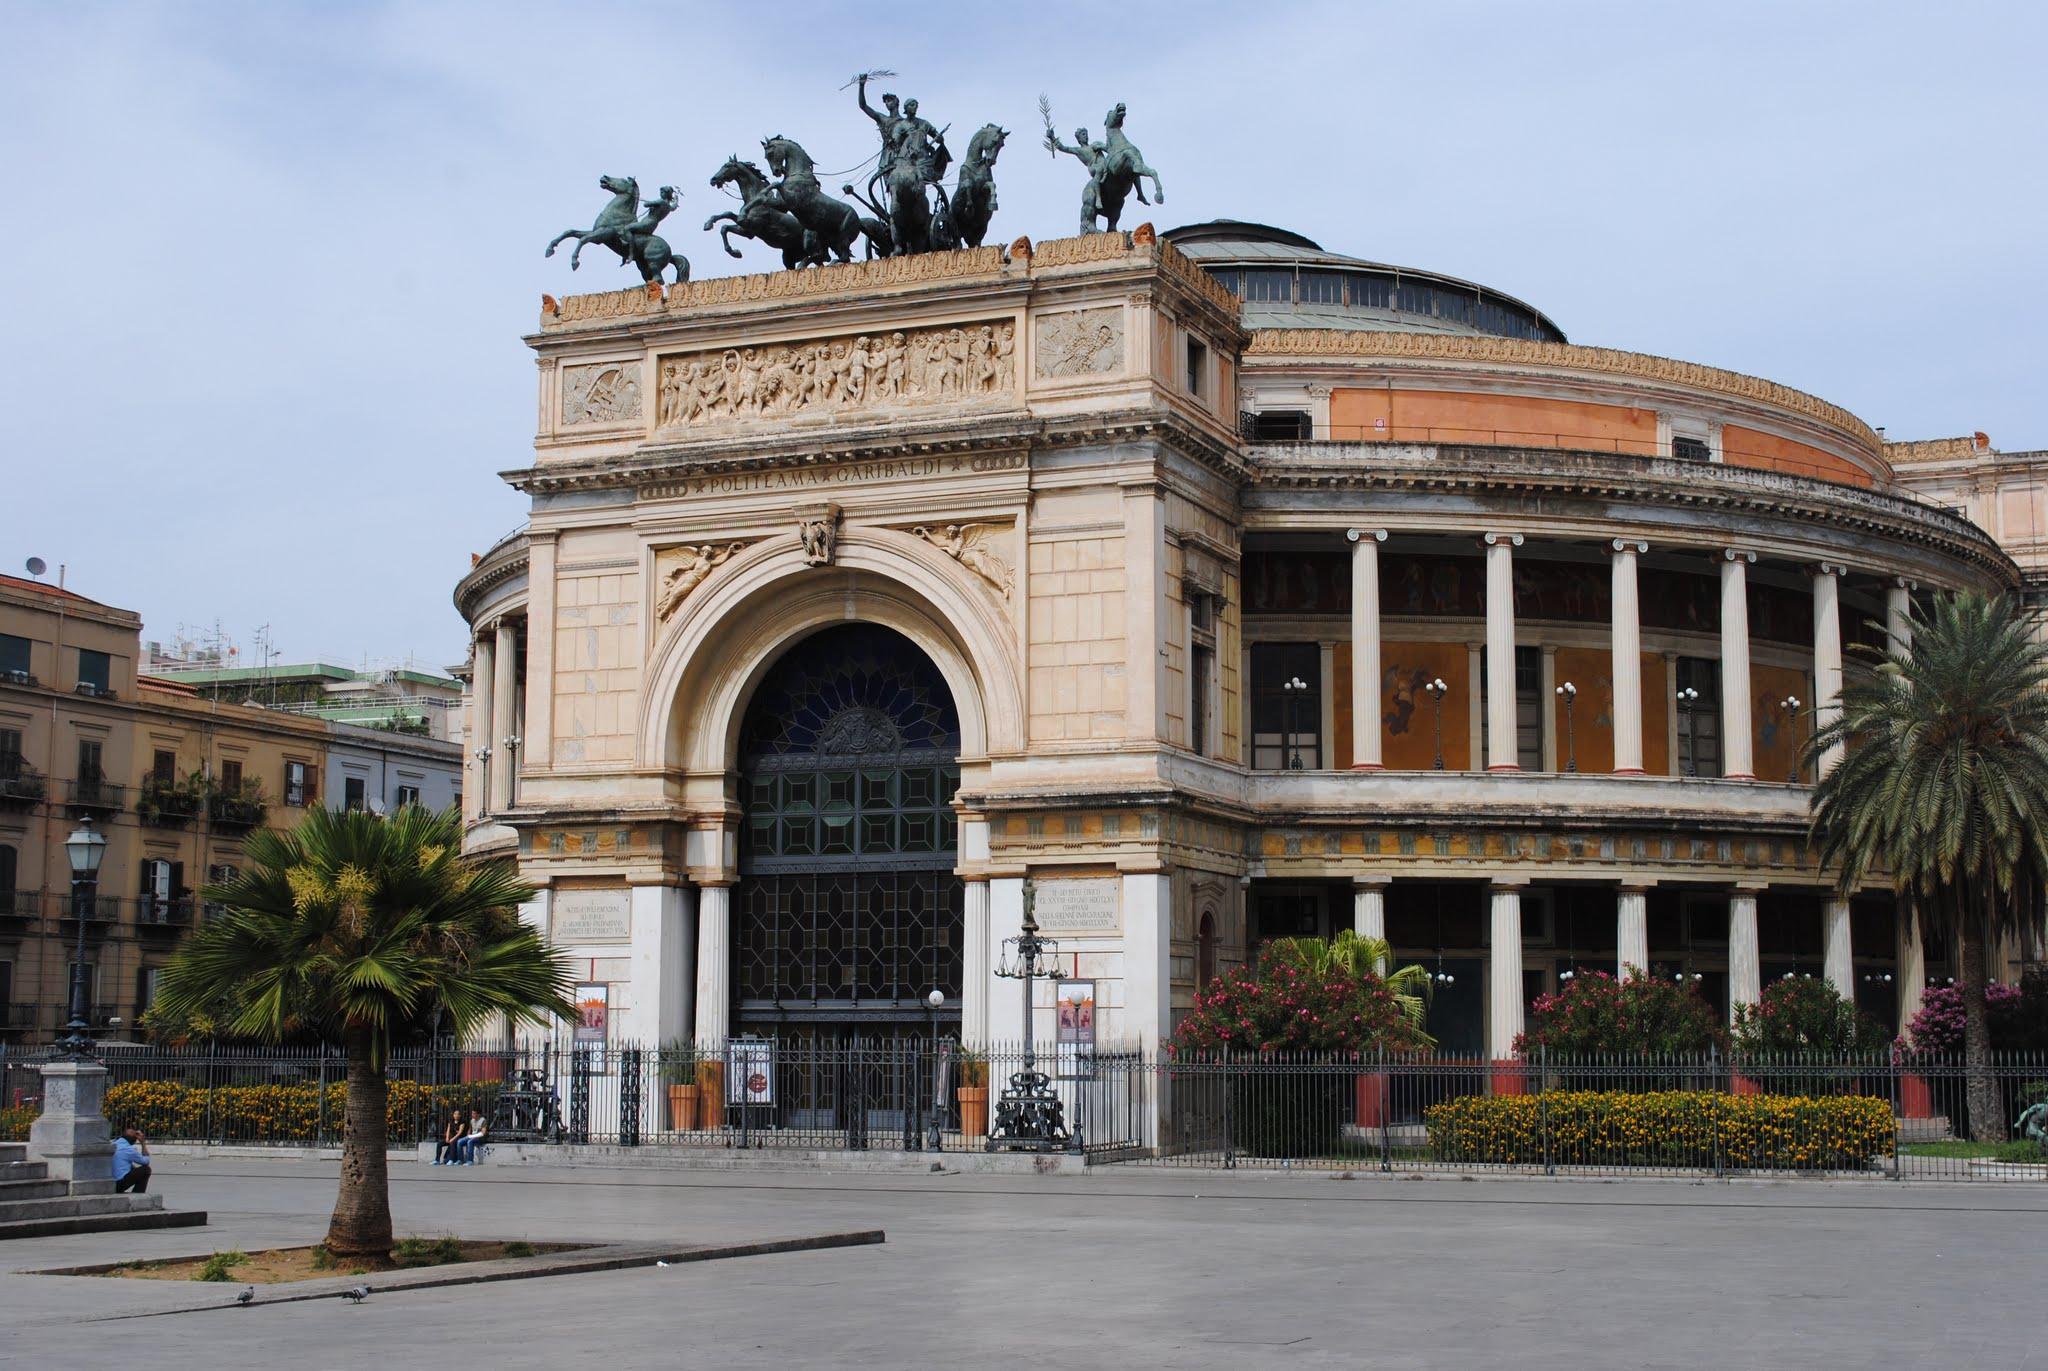 My Photos: Italy -- Sicily -- Palermo -- Piazza Ruggero Settimo